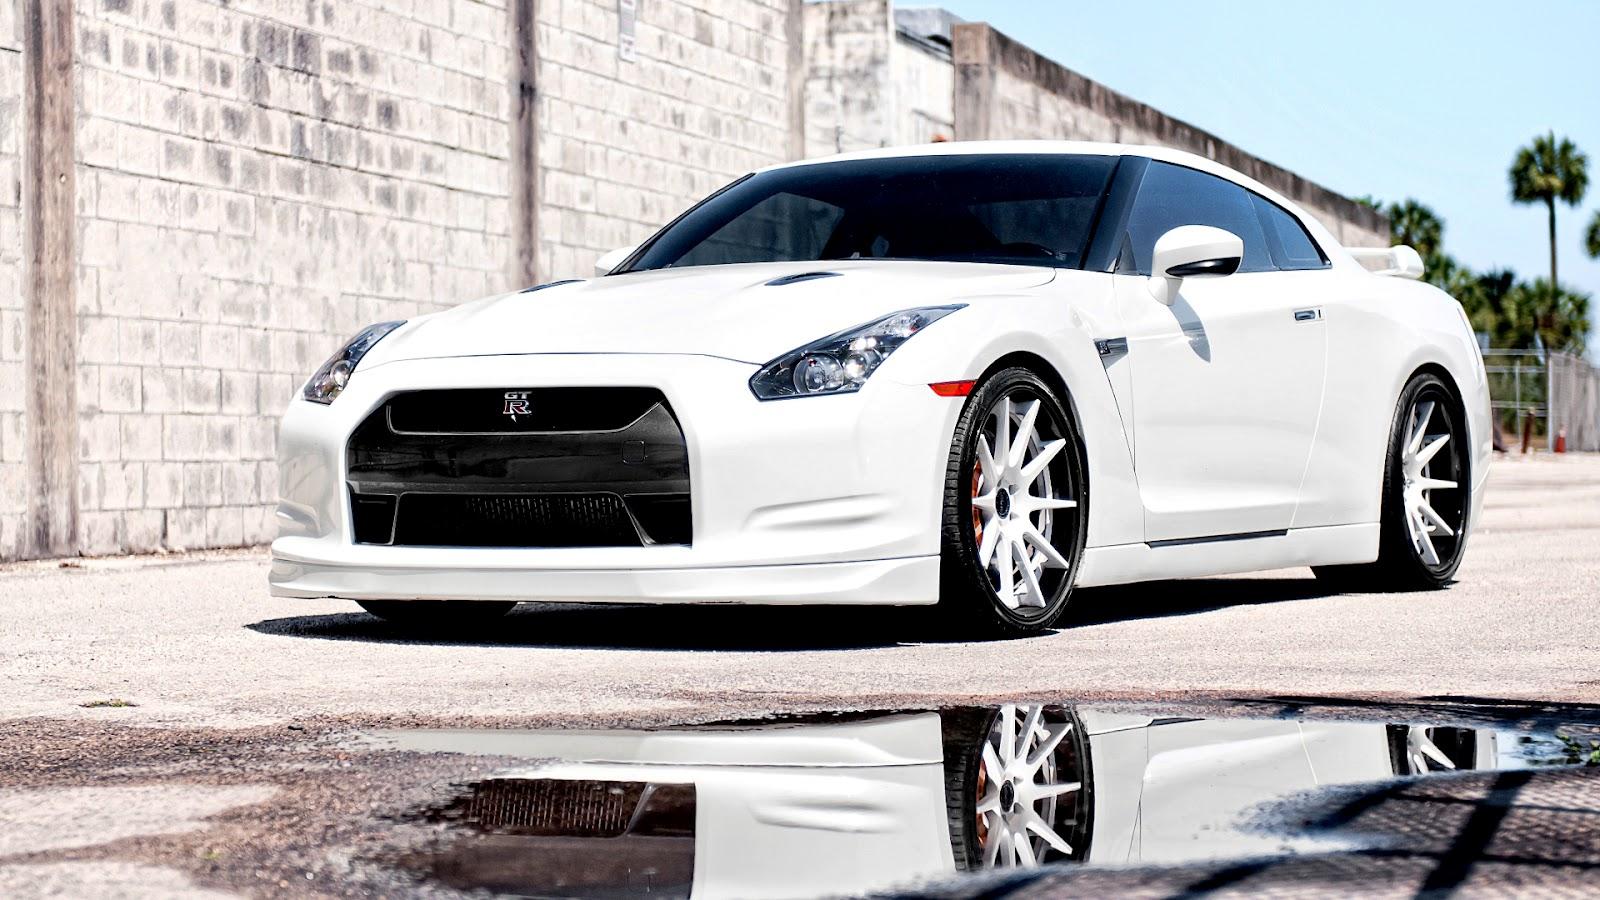 Free cars hd nissan gtr hd wallpapers - Nissan gtr hd wallpaper ...